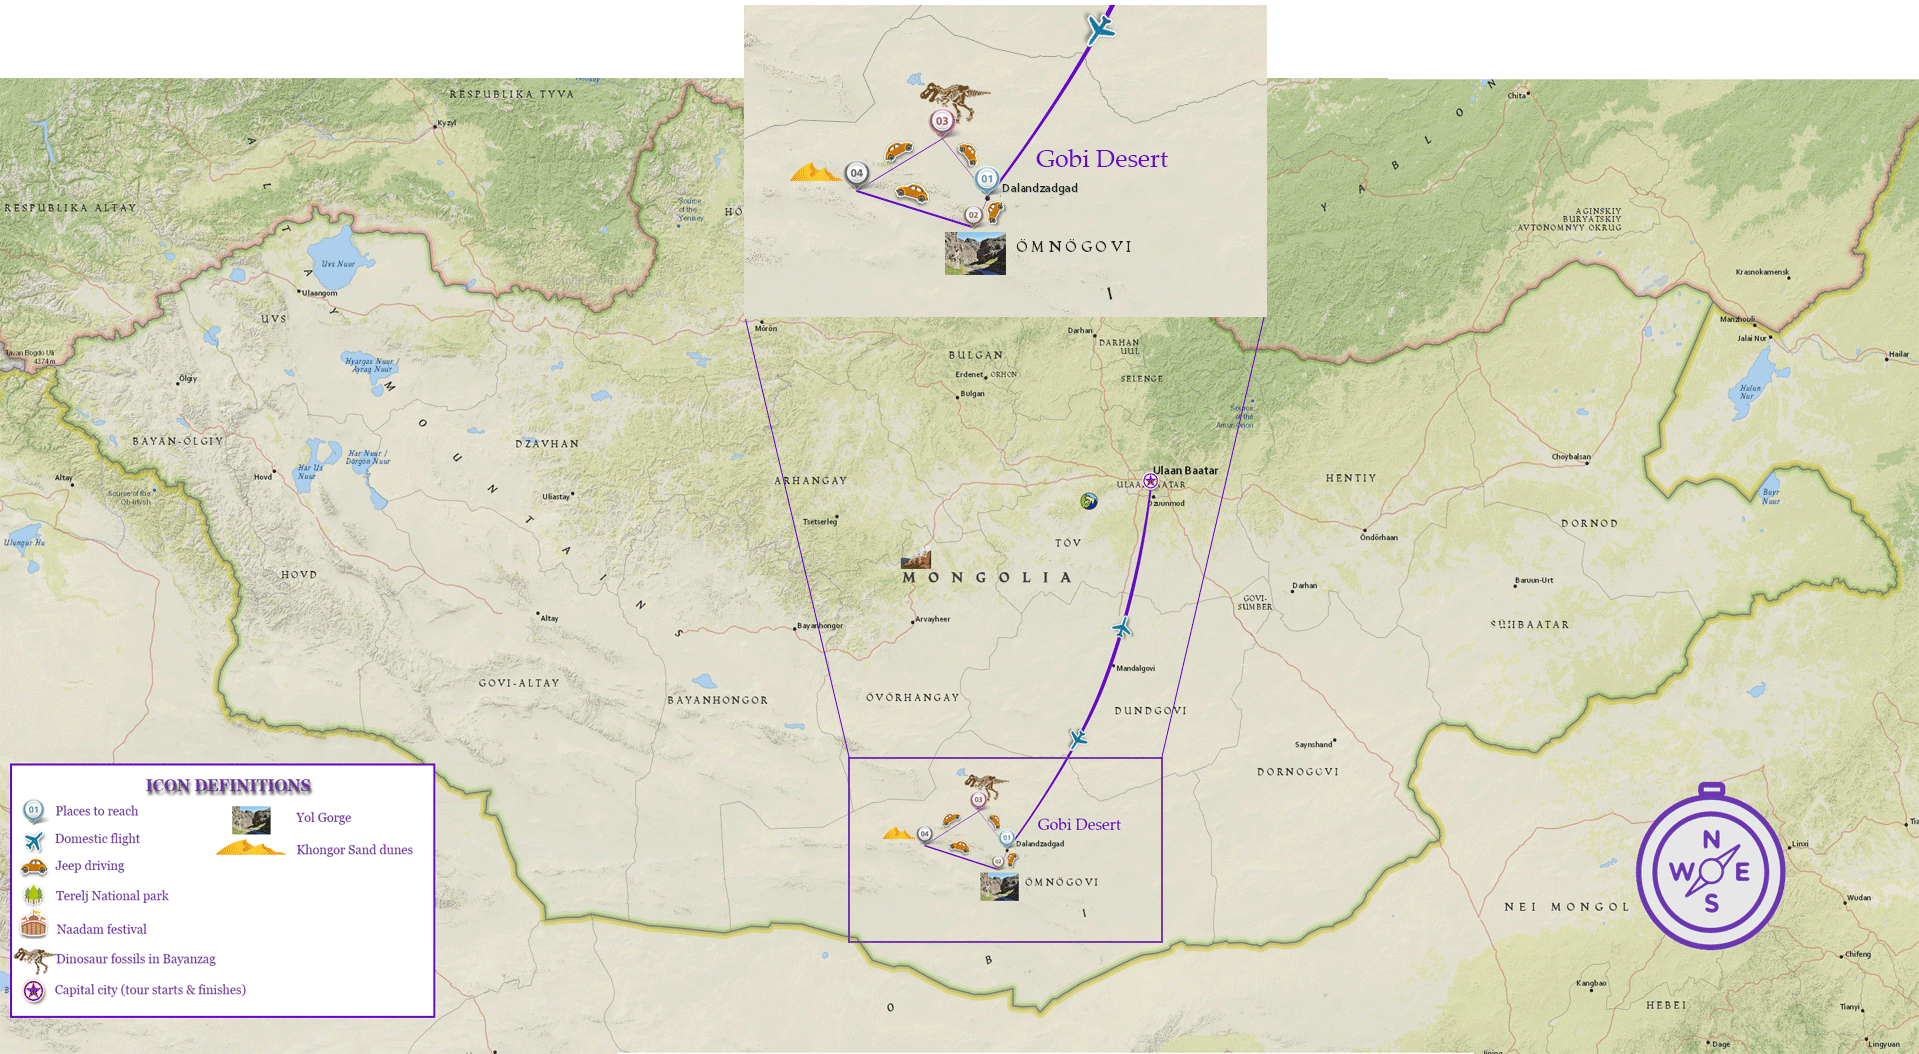 The Gobi Desert of Mongolia tour Gobi Desert Map on syrian desert map, south china sea, atacama desert map, great basin desert map, atlas mountains, tarim basin map, gulf of tonkin map, lake baikal, bay of bengal map, mojave desert map, thar desert map, outback map, namib desert, patagonia desert map, namib desert map, mediterranean sea map, taklamakan desert map, manchurian plain map, sonoran desert, yangtze river, great dividing range map, great wall of china, kalahari desert, mongolia map, arabian desert, thar desert, patagonian desert, amazon river, antarctica map, silk road, kalahari desert map, tian shan mountains map, tibetan plateau, tibetan plateau on map, mojave desert,